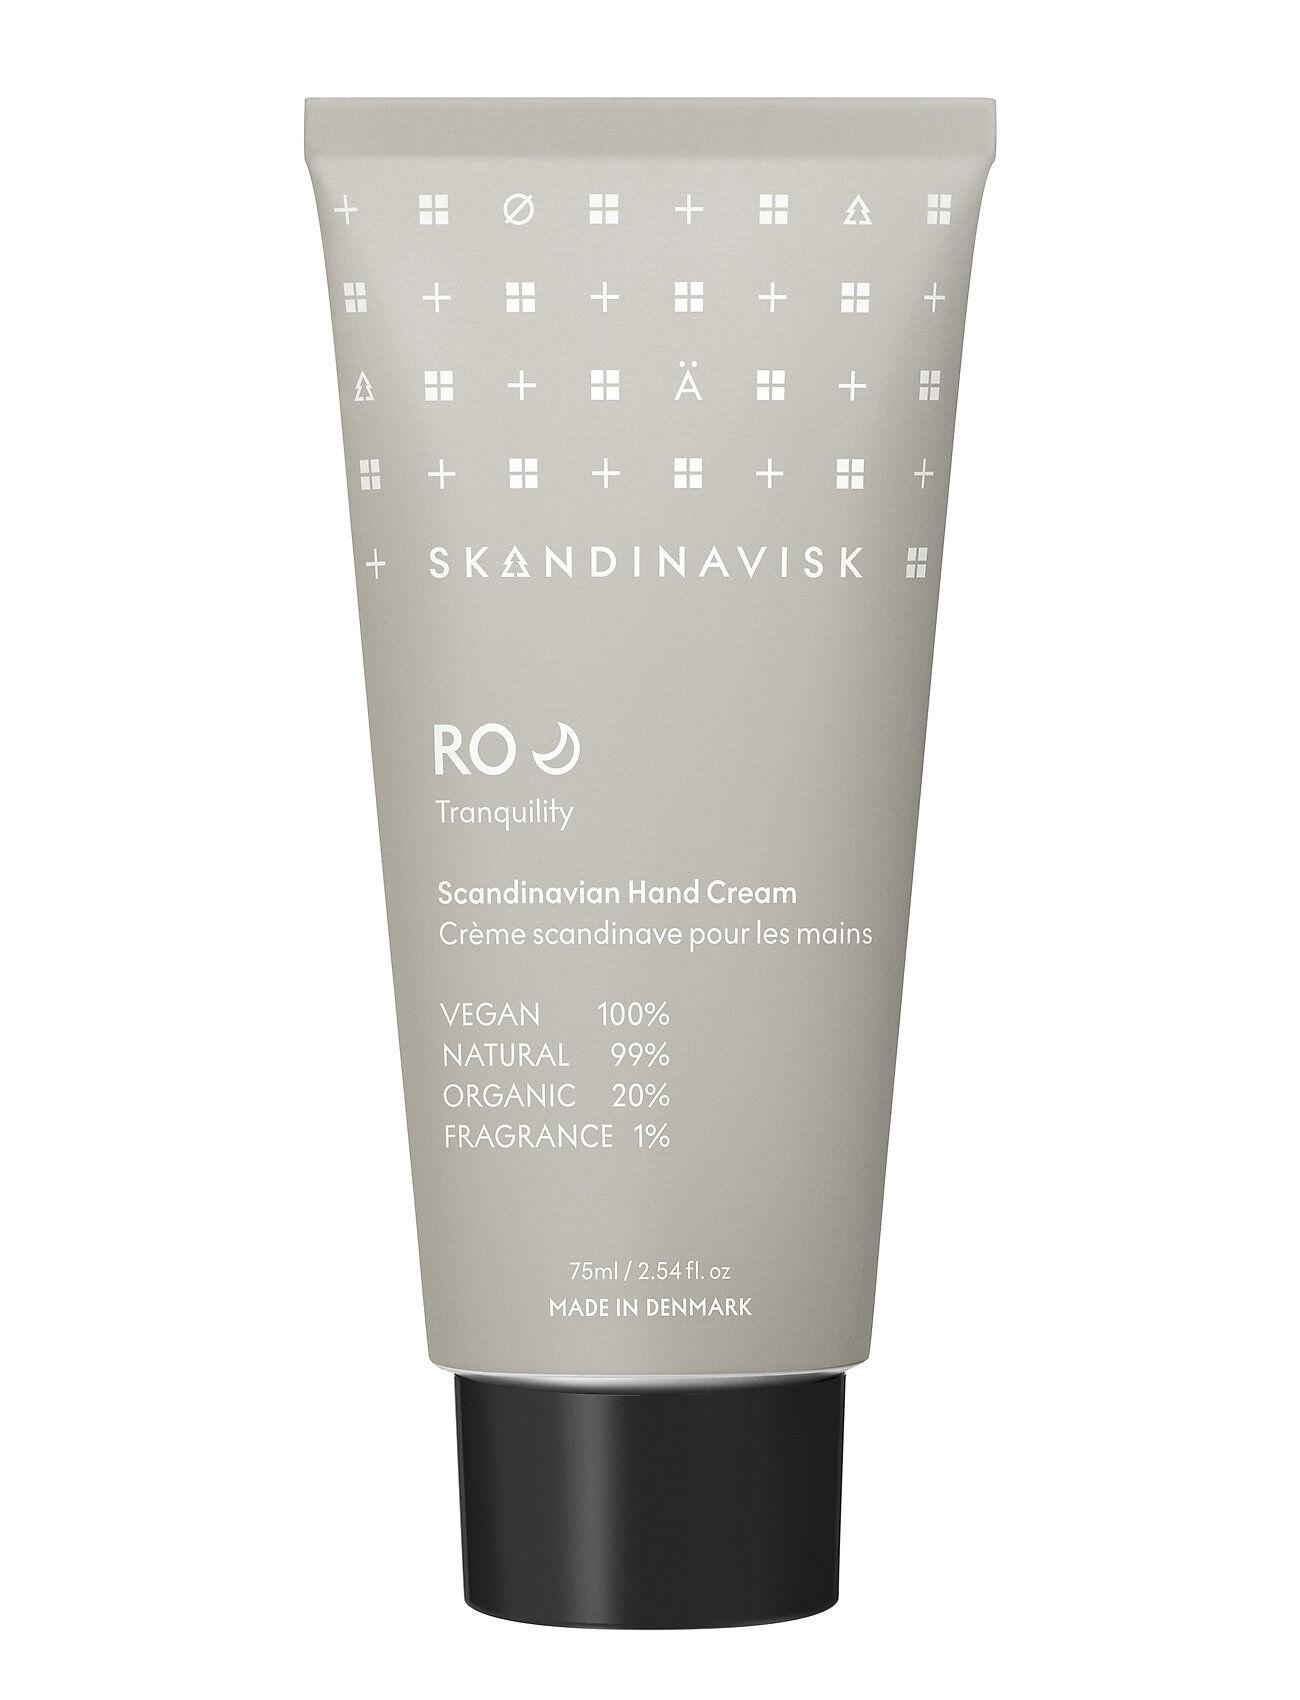 Skandinavisk Ro Hand Cream 75ml Beauty MEN Skin Care Body Hand Cream Nude Skandinavisk